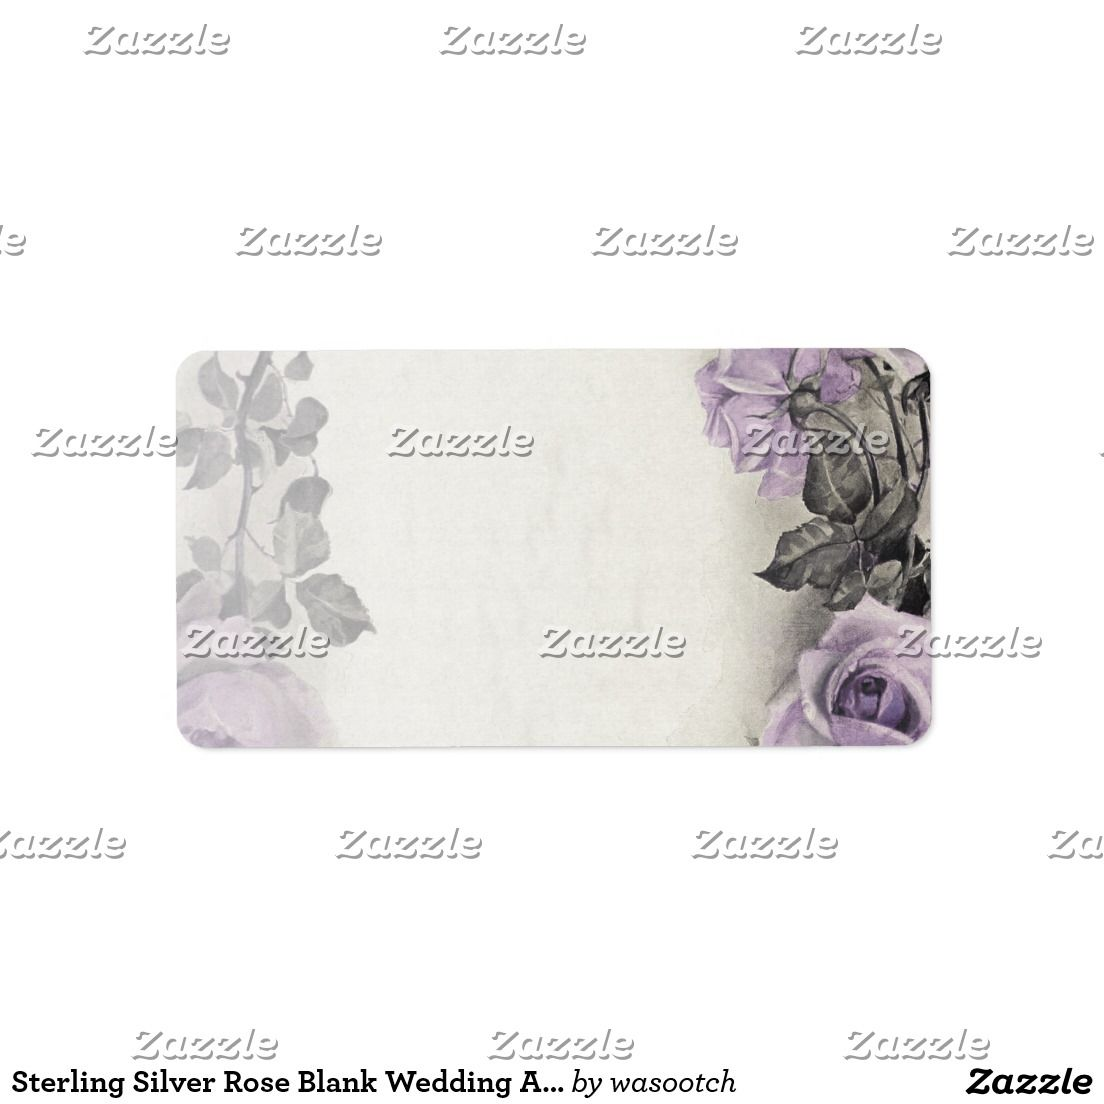 sterling silver rose blank wedding address labels wedding address